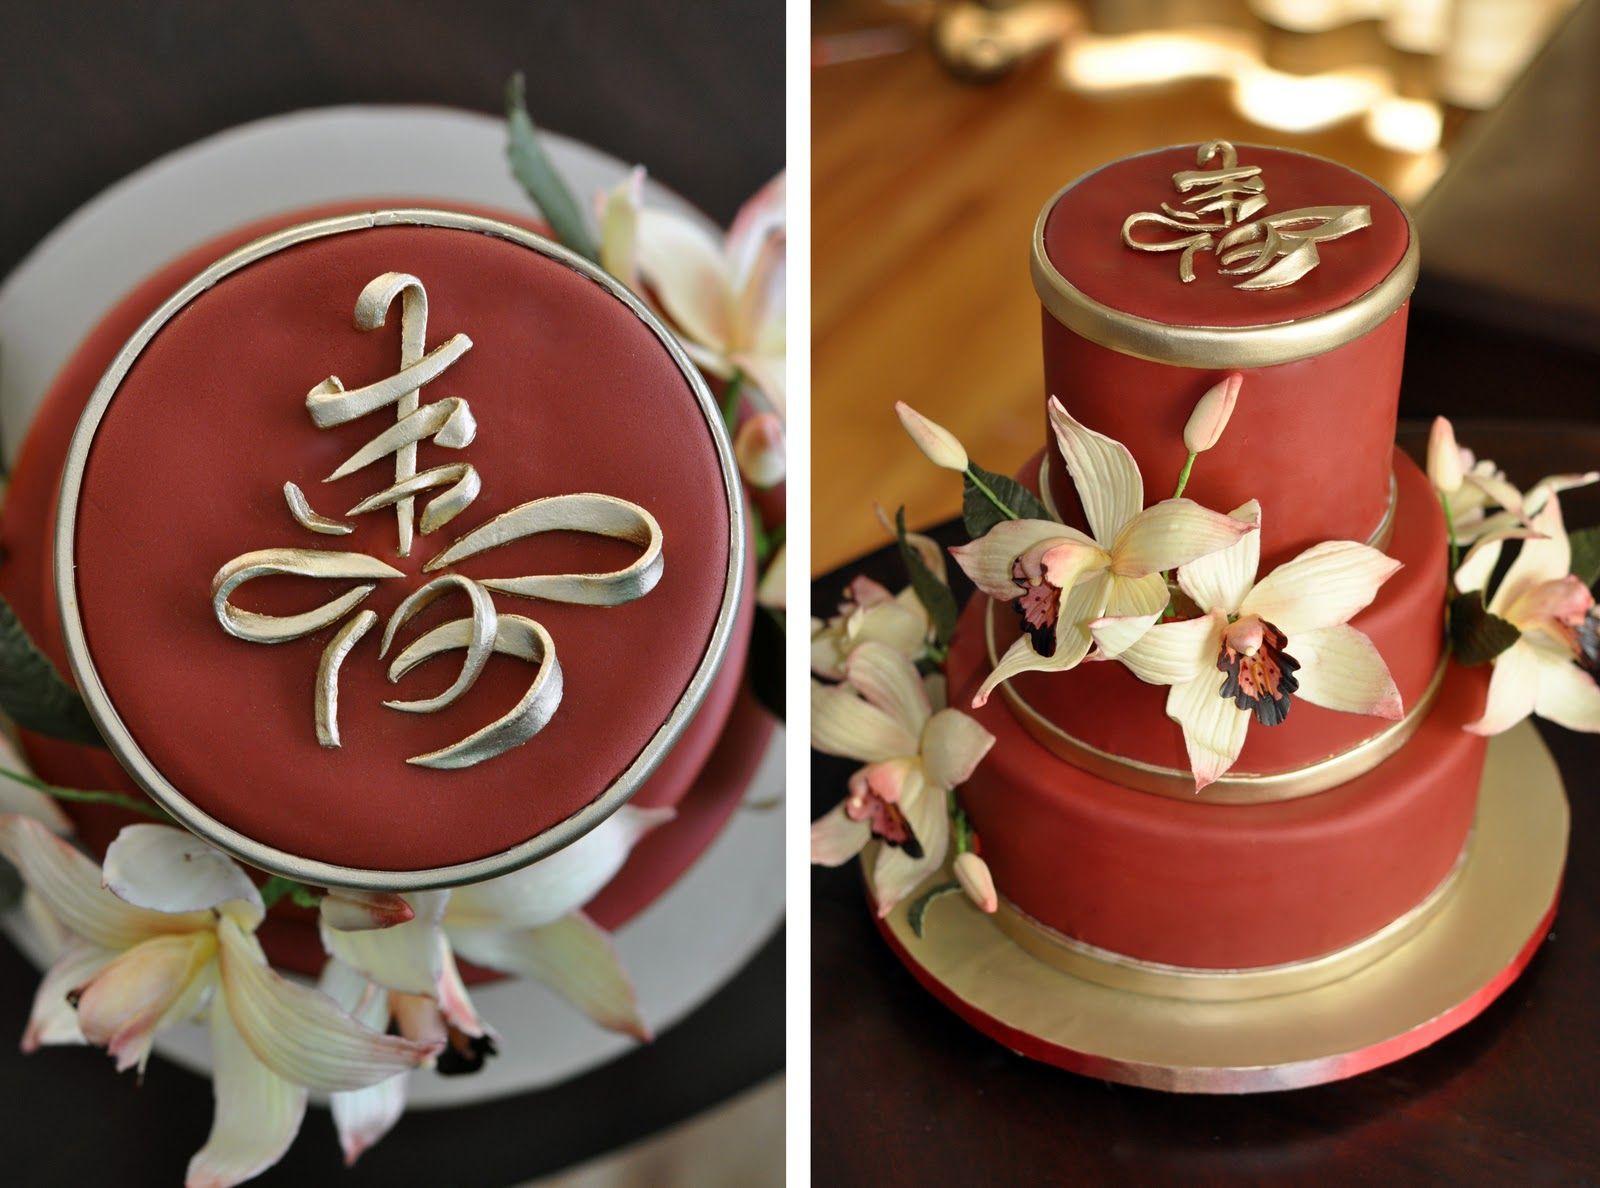 Chinese Longevity Birthday Cake The Most Gorgeous Ever Seen - Birthday cake chinese style